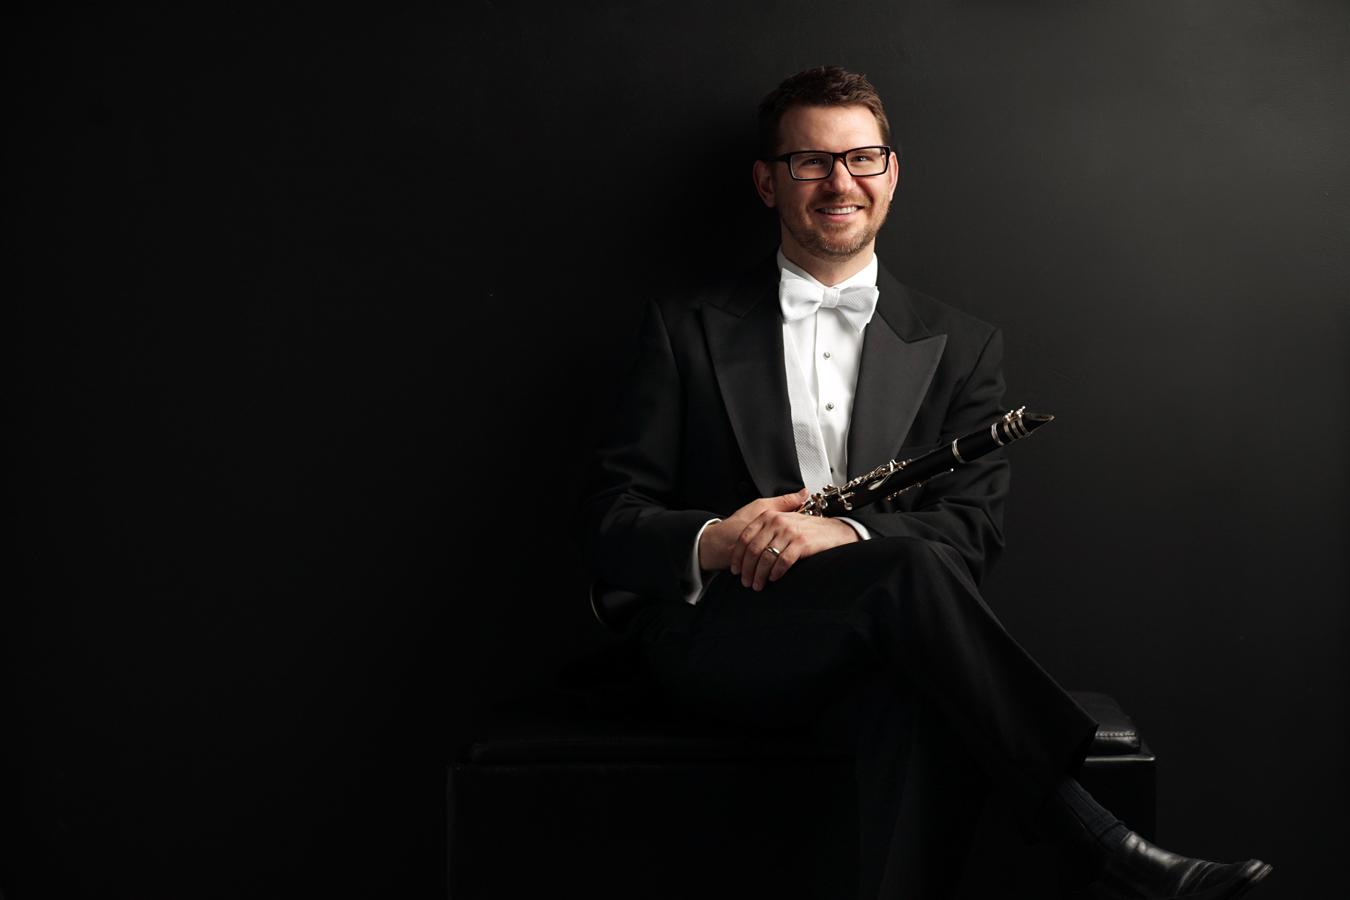 Matthew Nelson Clarinet by Tina Gutierrez 15Re